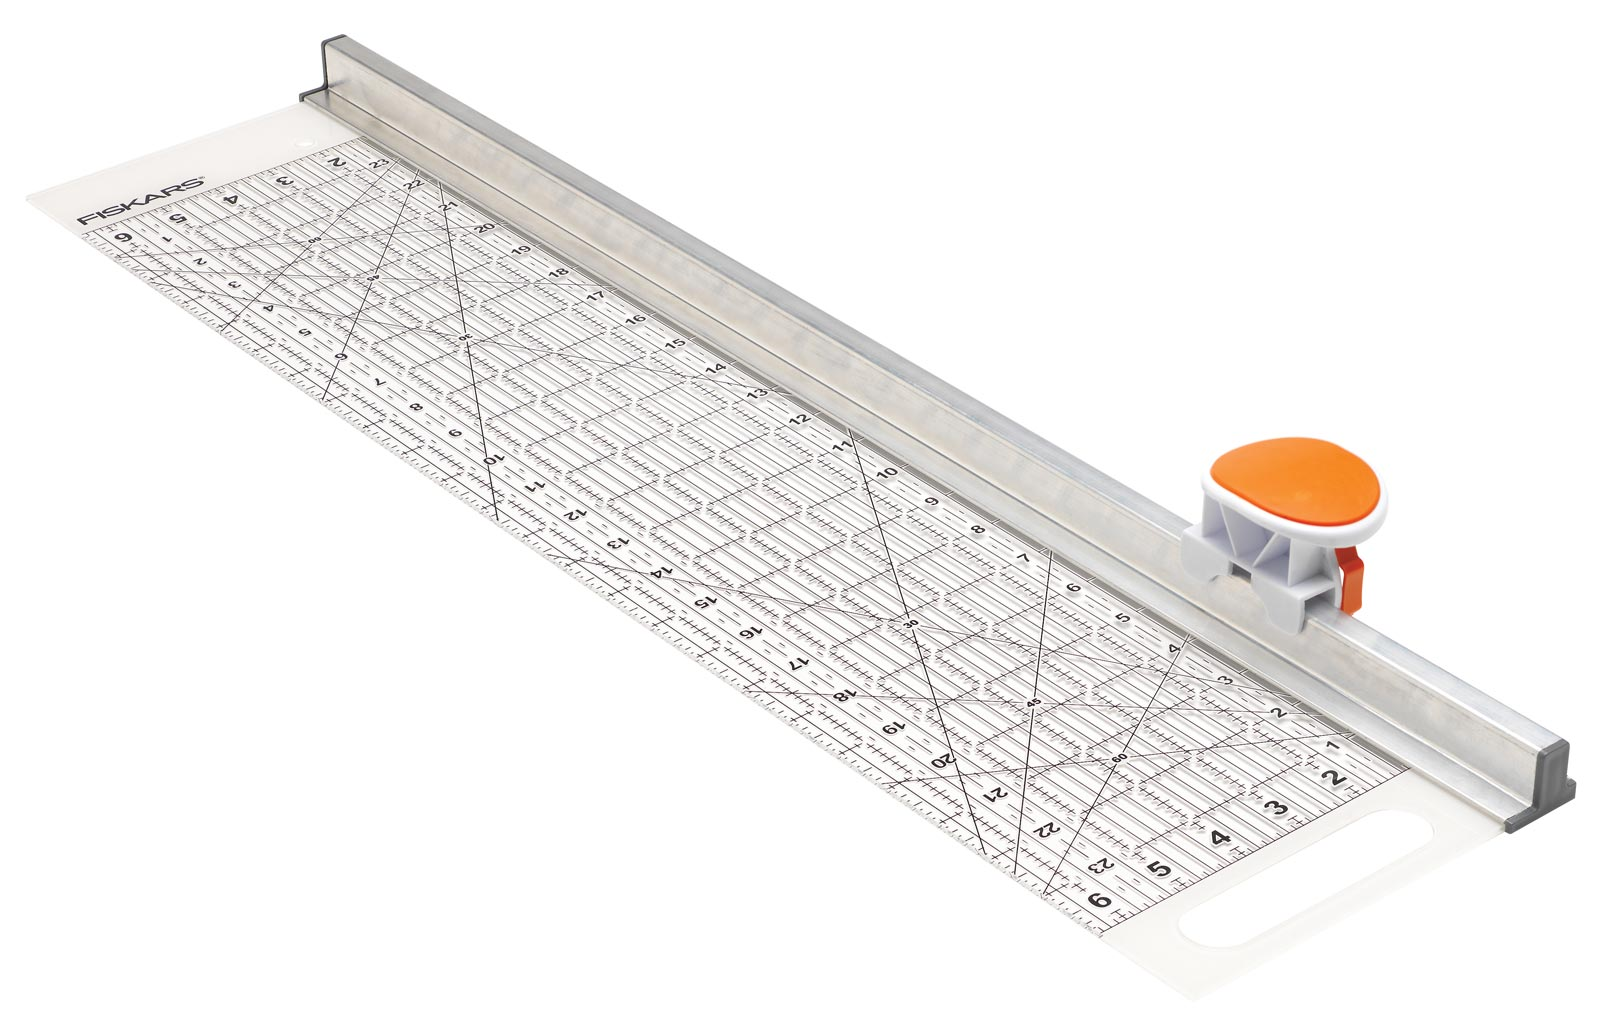 Fiskars rotary cutter set